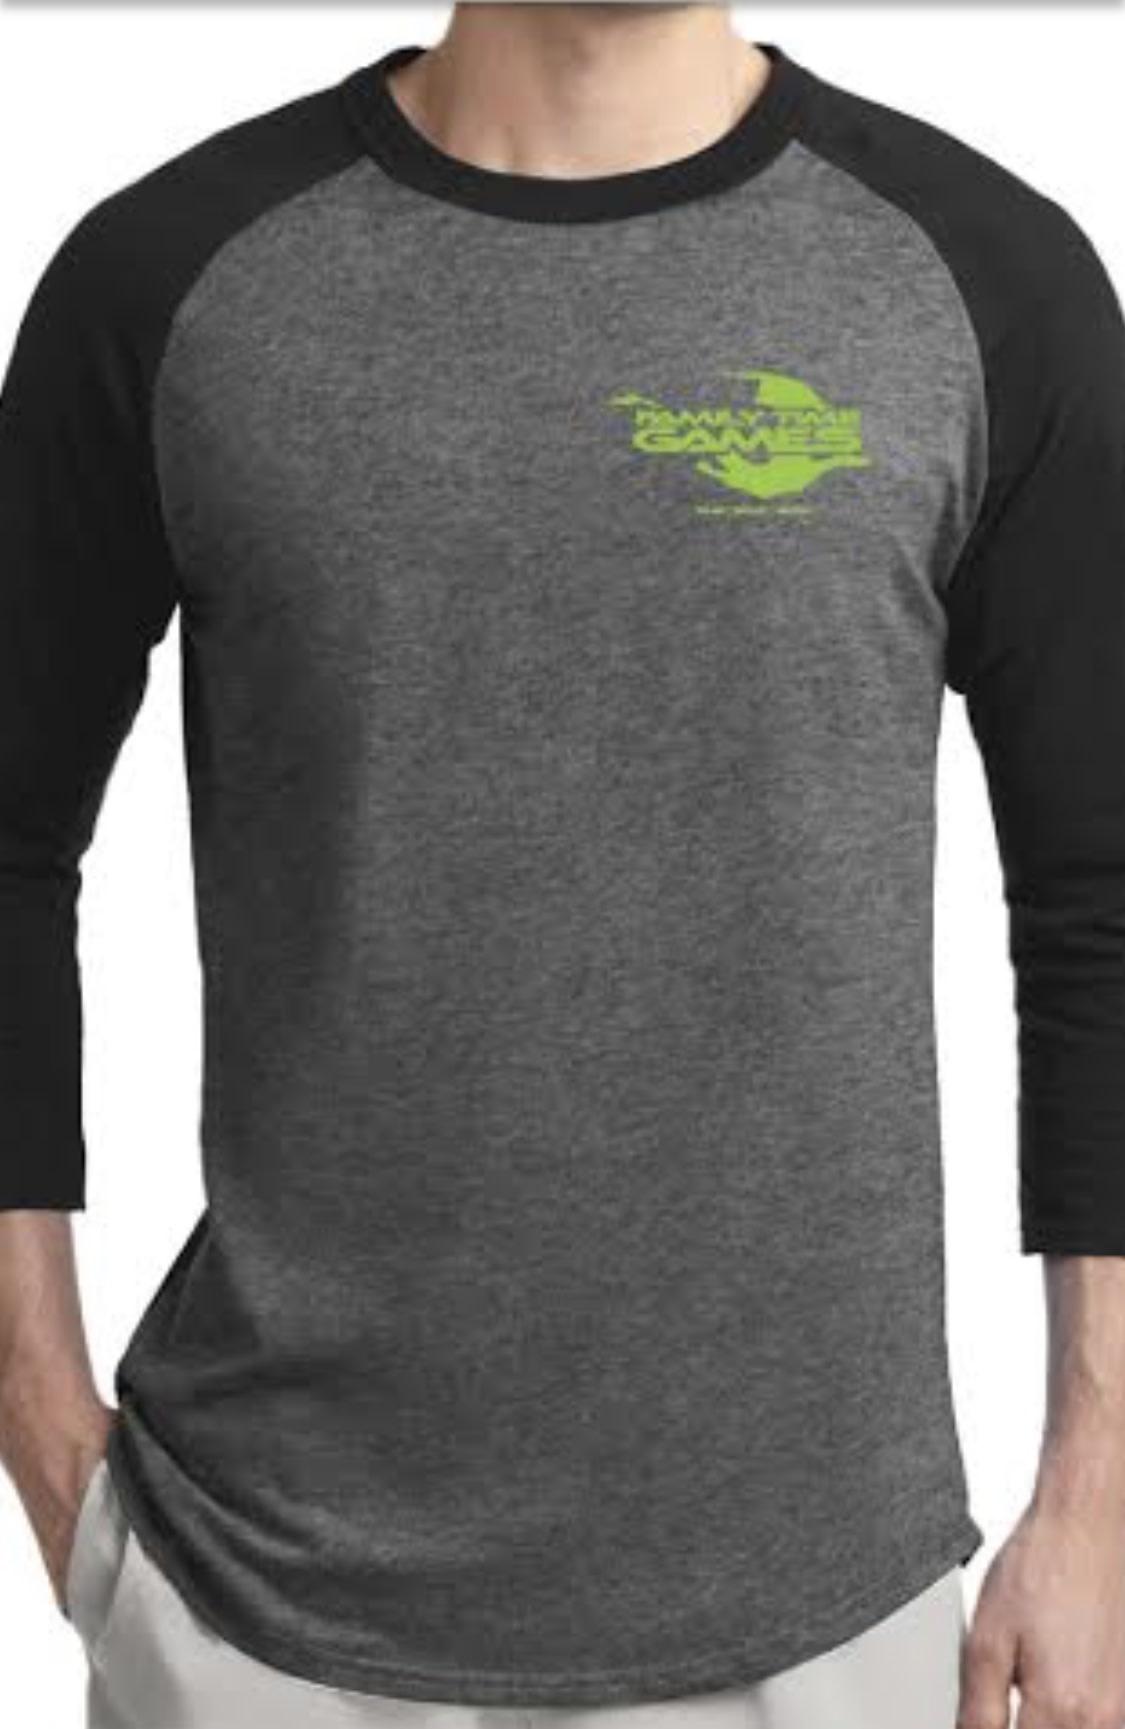 Team image 5 year Anniversary baseball jersey (sizeXXXXL)